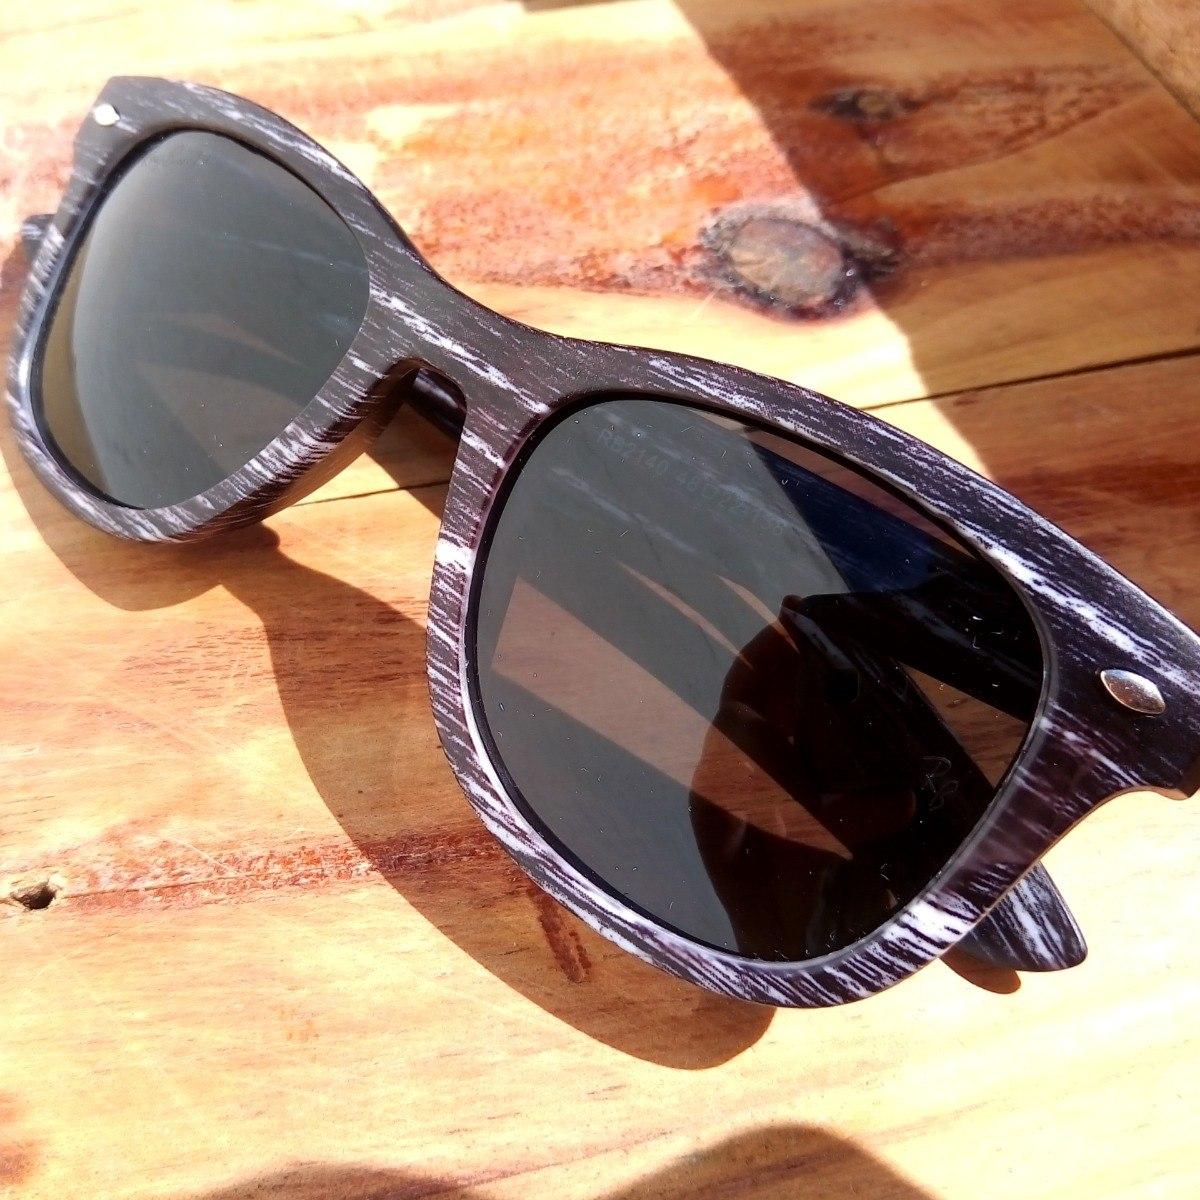 5c4a5918df228 oculos ray ban wayfarer estilo madeira rb2140 polarizado. Carregando zoom.